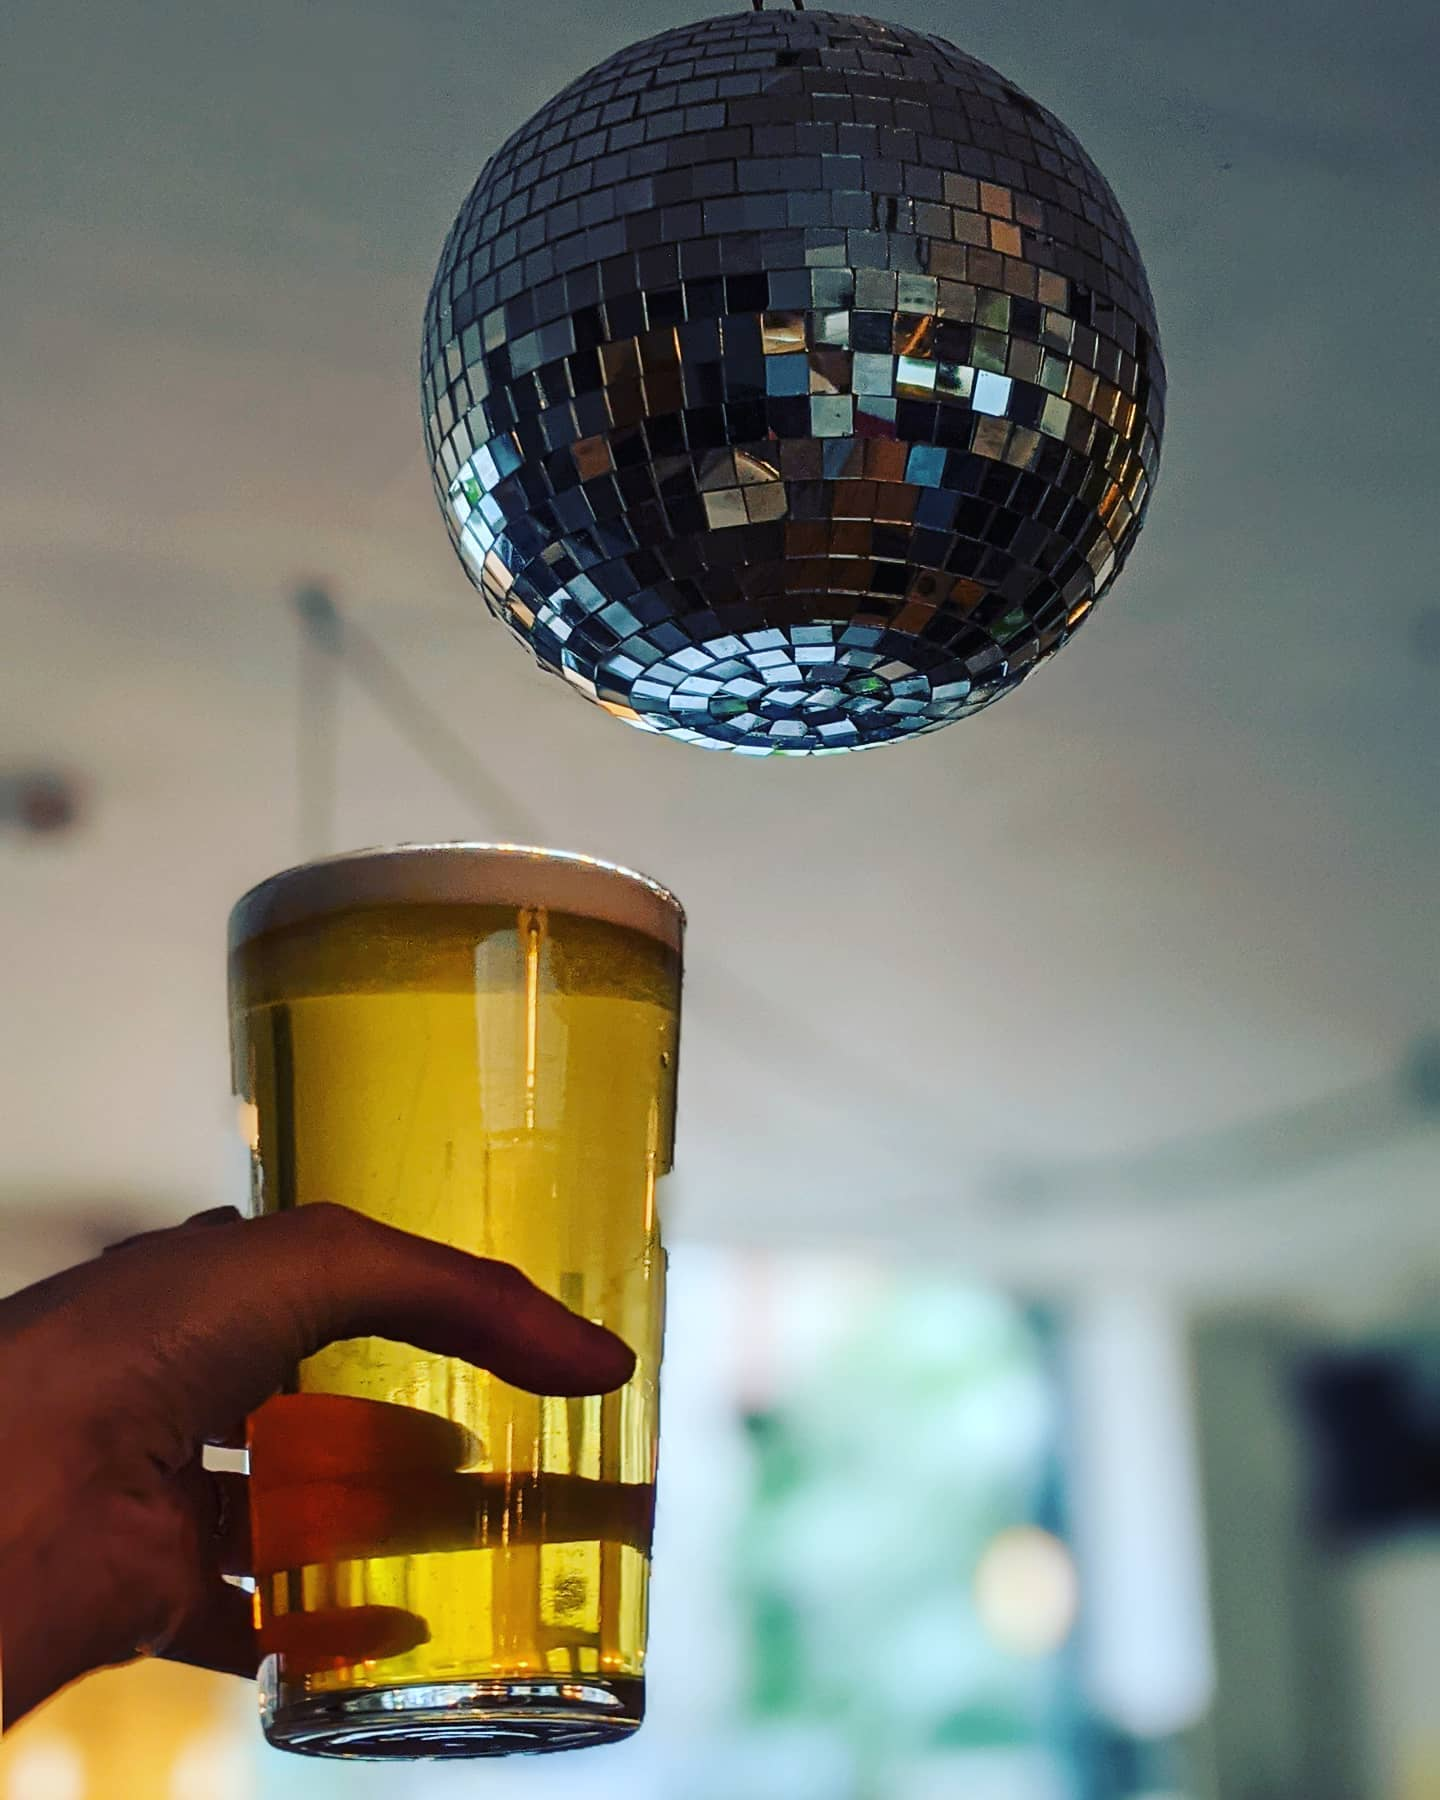 Remember this? It's a GLASS of beer. With your name on it.   See you in 5 days.  . . . #glassofbeer🍺 #glassofbeer #terracegarden #outdoordrinking #outdoorseatingarea #outdoorseating #hackneypubs #hackneyweddings #welovehackney #supportsmallbusiness #supportyourlocal #supportpubs #hackneycocktails #letthebeerflow #lettherebebeer #lettherebelight #bringonthefun #hackneyterrace